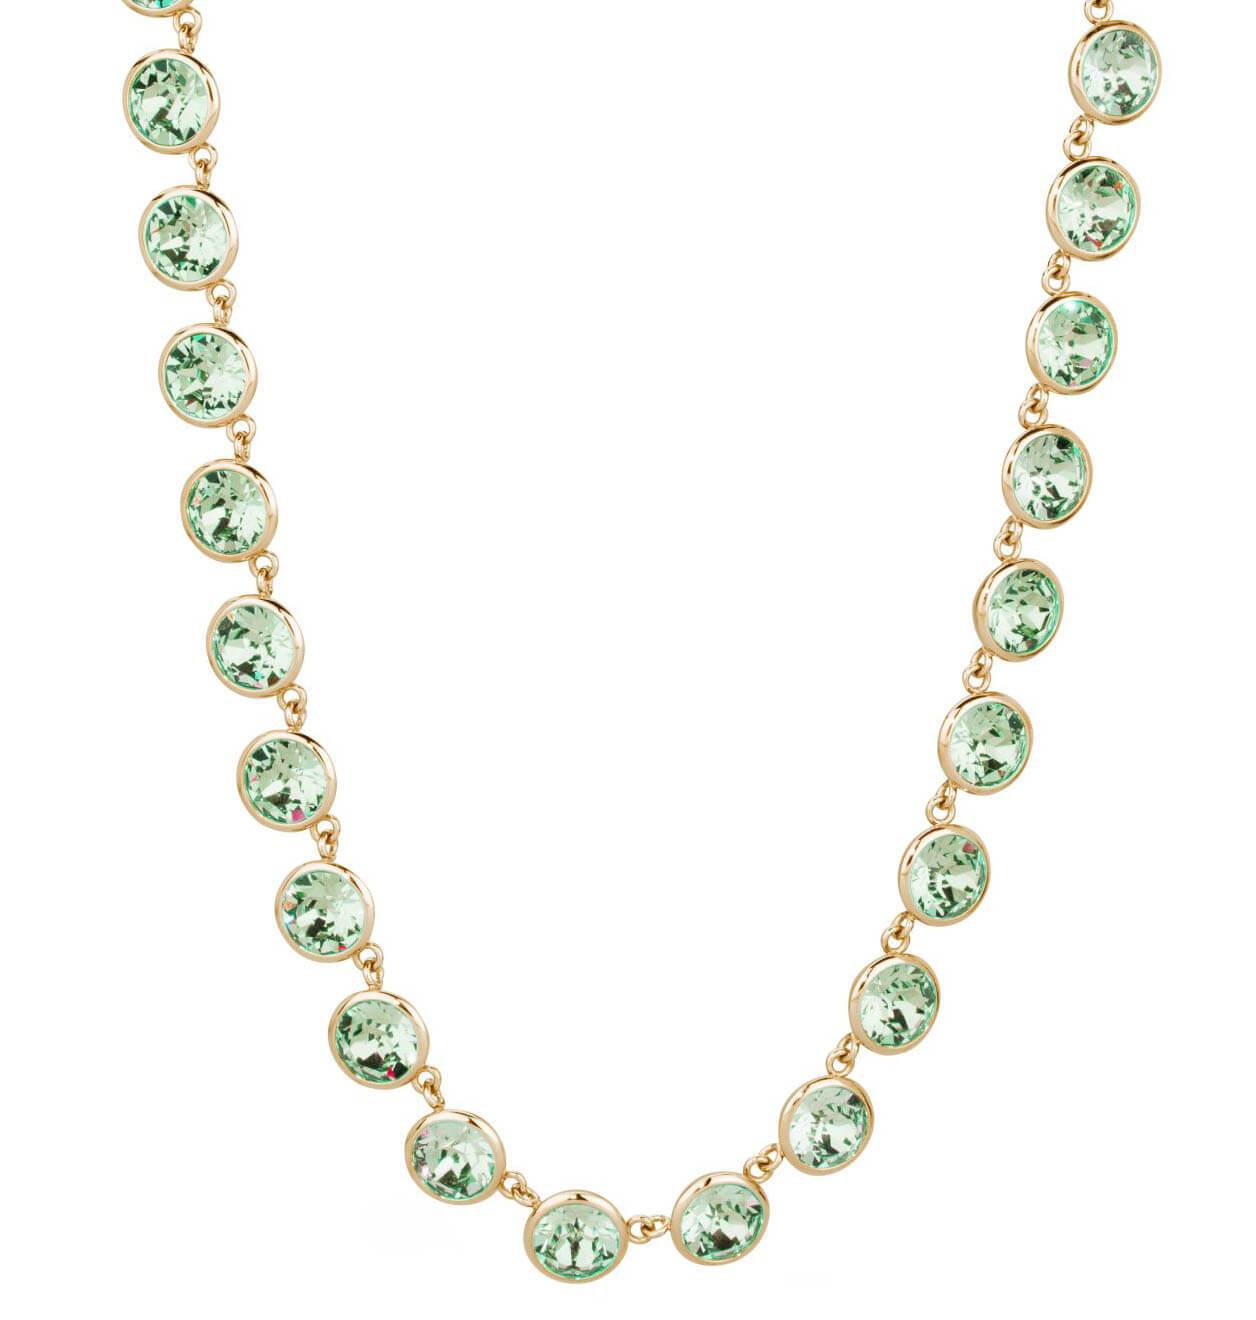 c13bd4c21 Brosway Ocelový náhrdelník s krystaly Swarovski N-Tring BTN36 ...